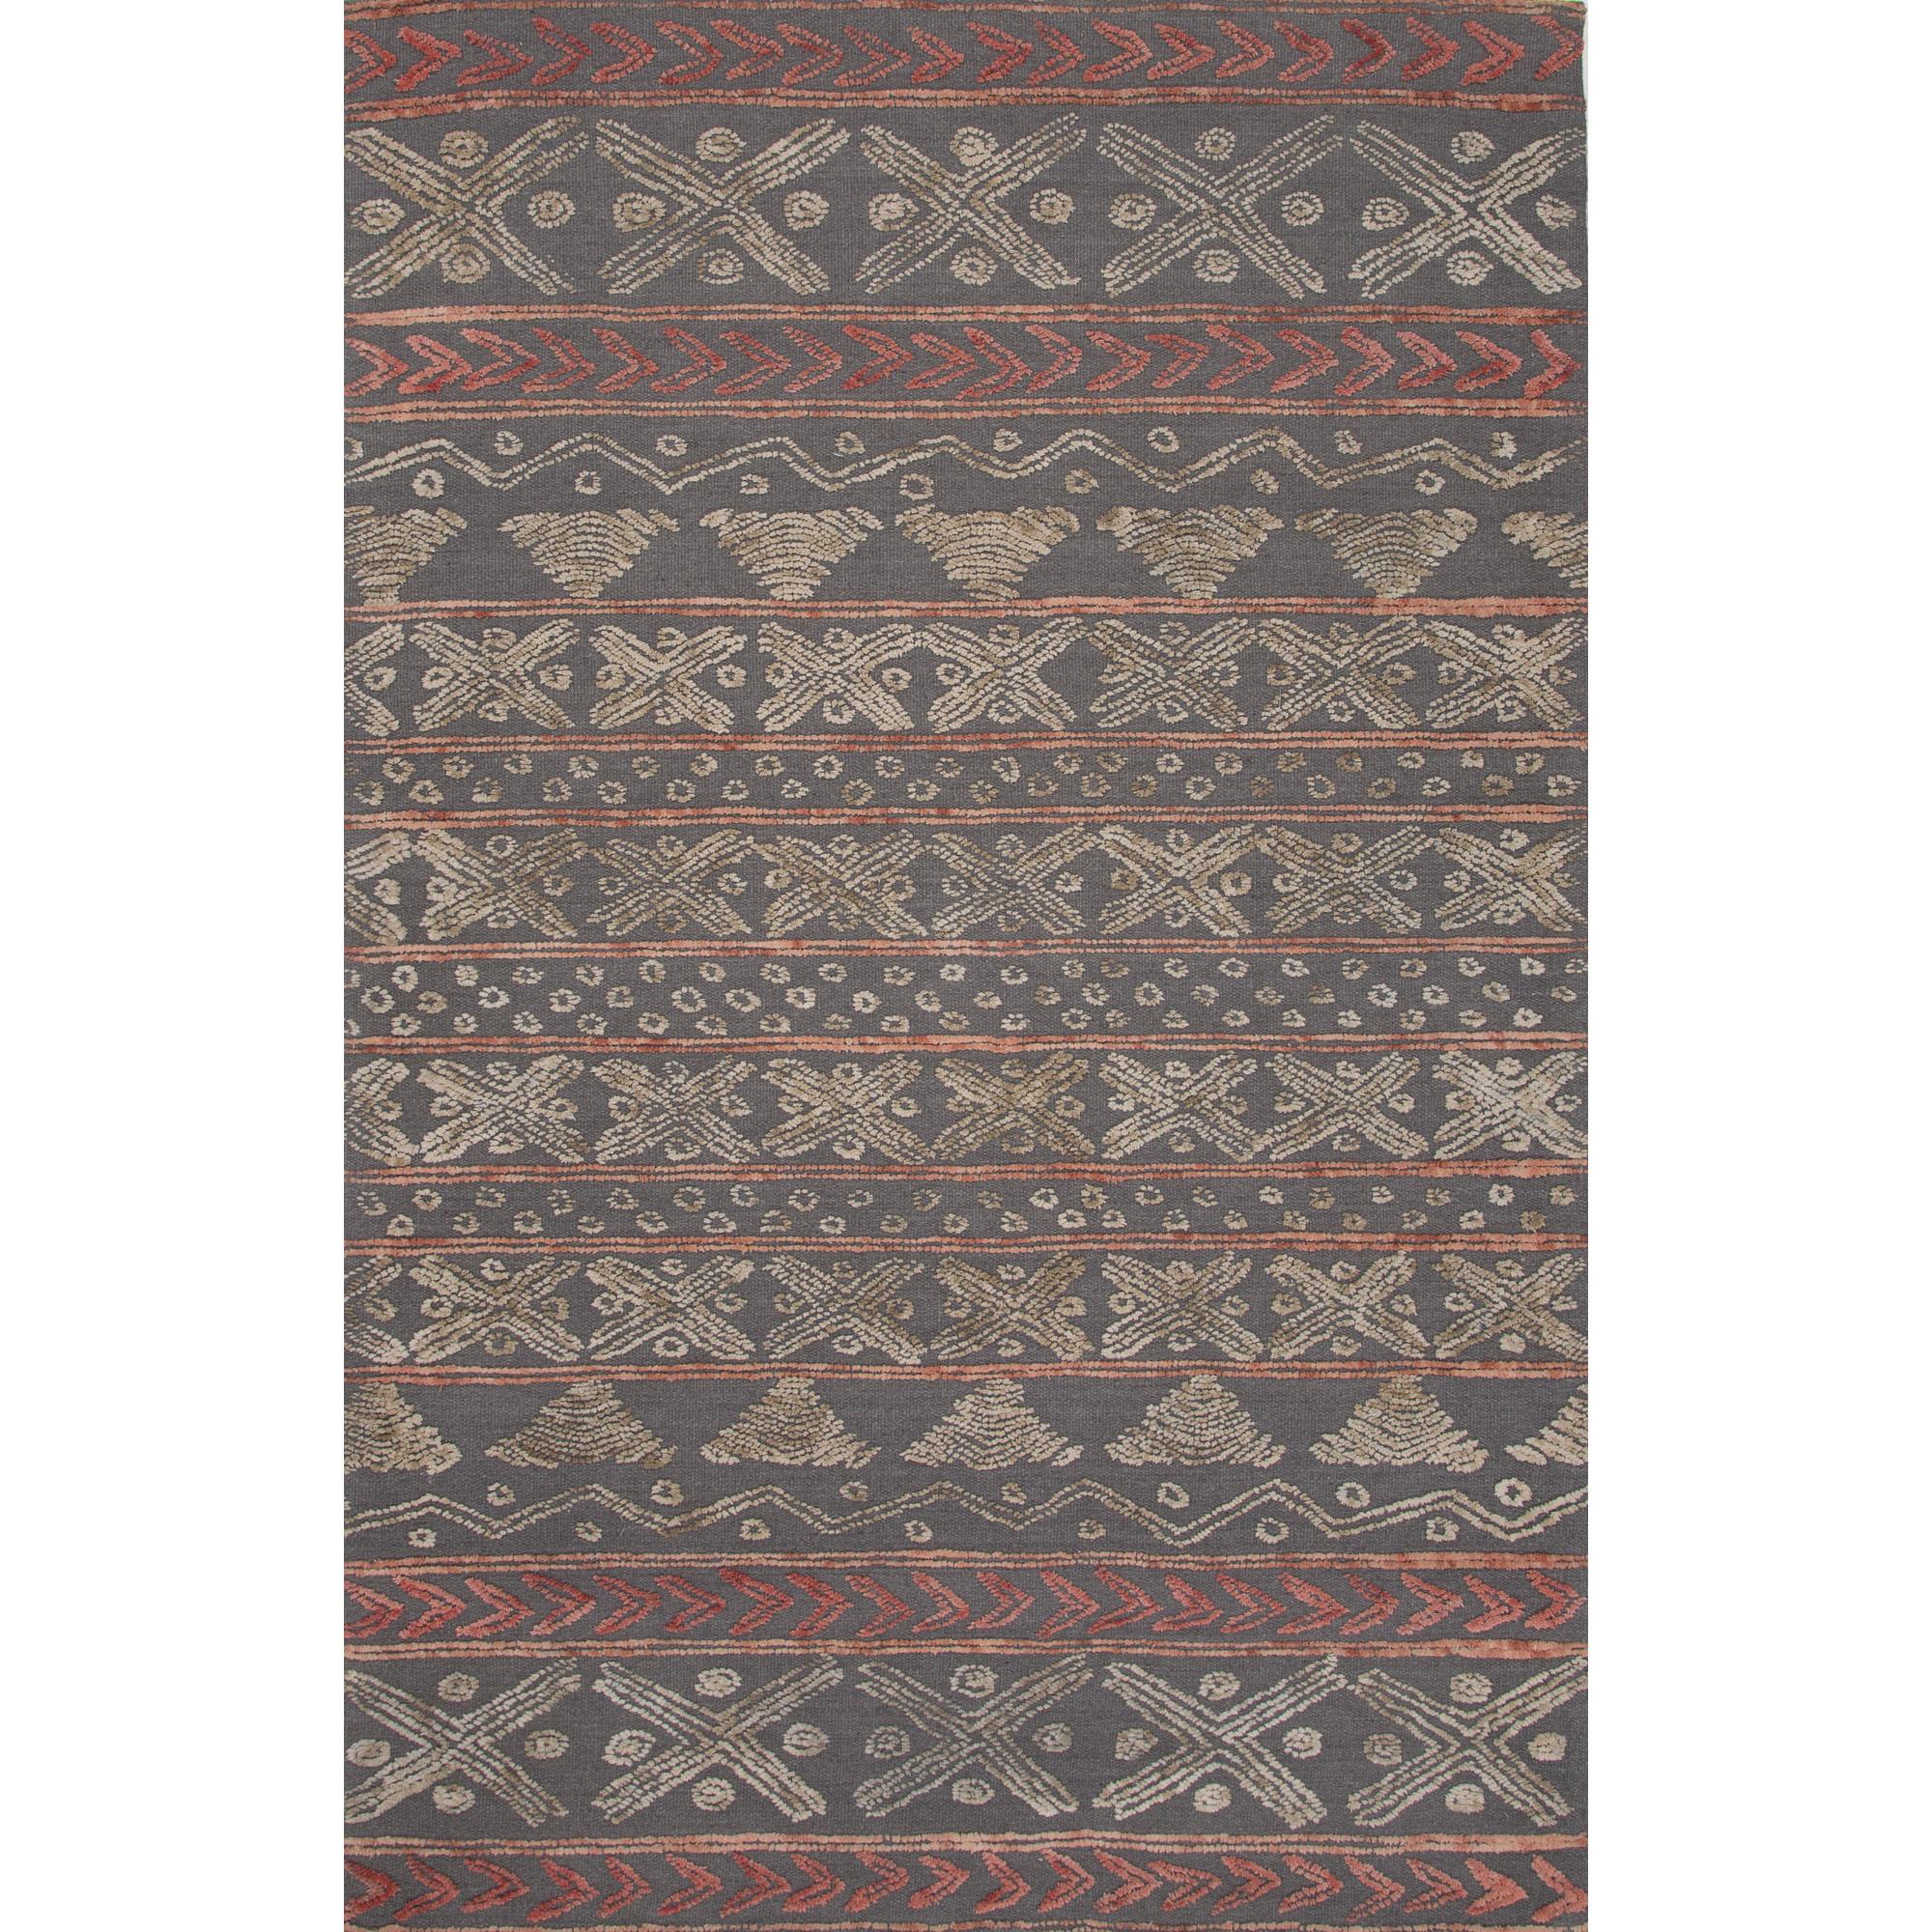 JAIPUR Rugs Stitched 5 x 8 Rug - Item Number: RUG121355